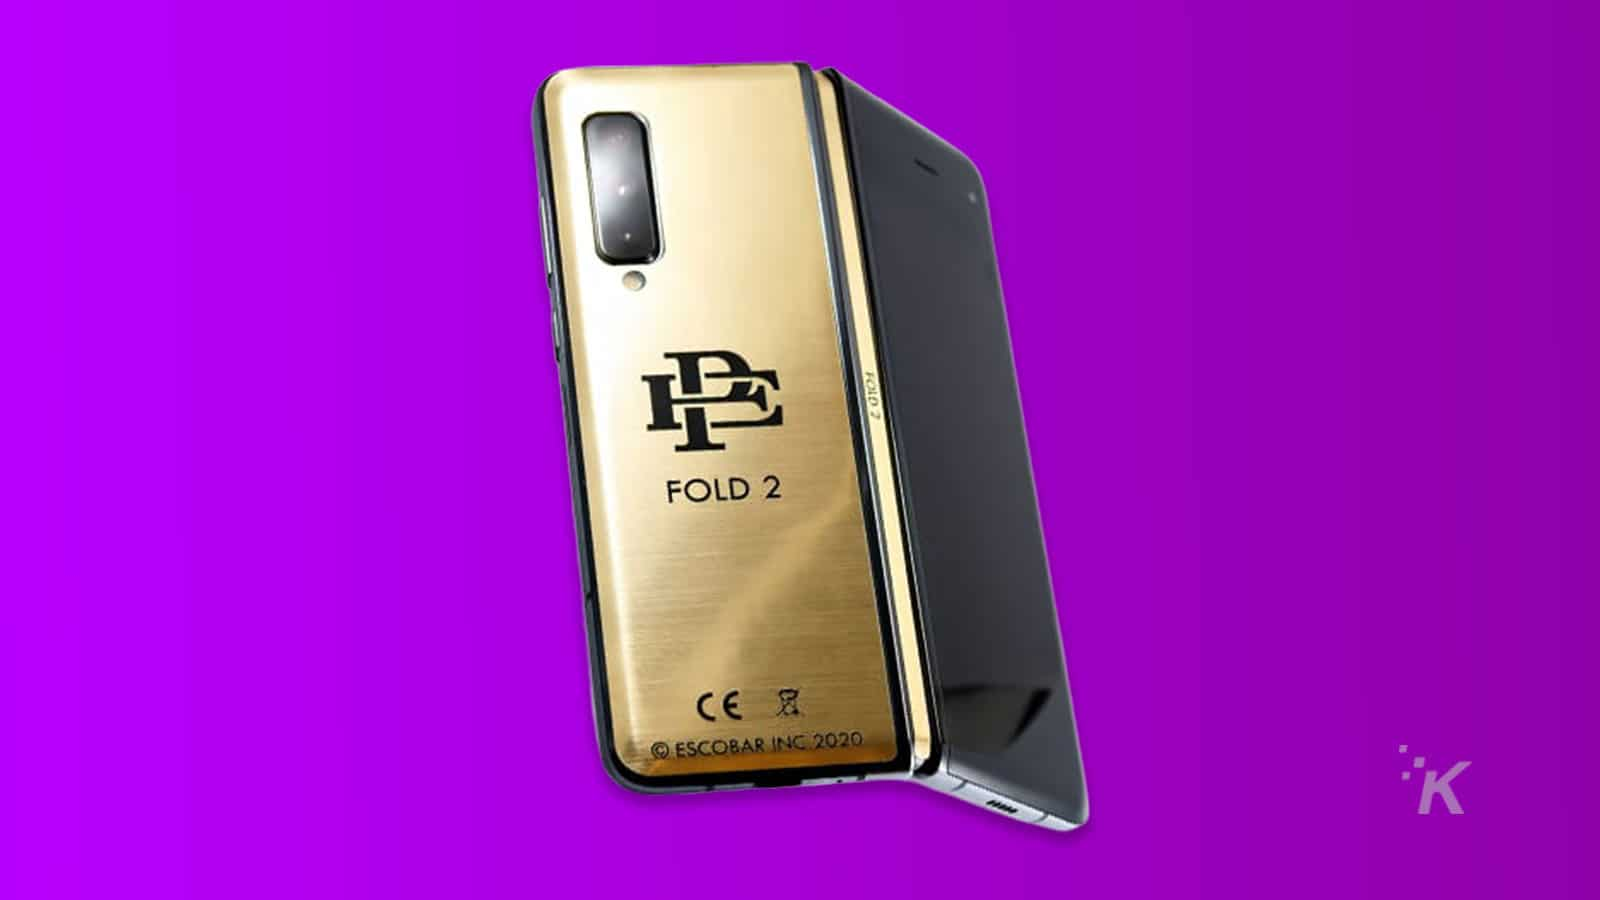 escobar fold 2 smartphone